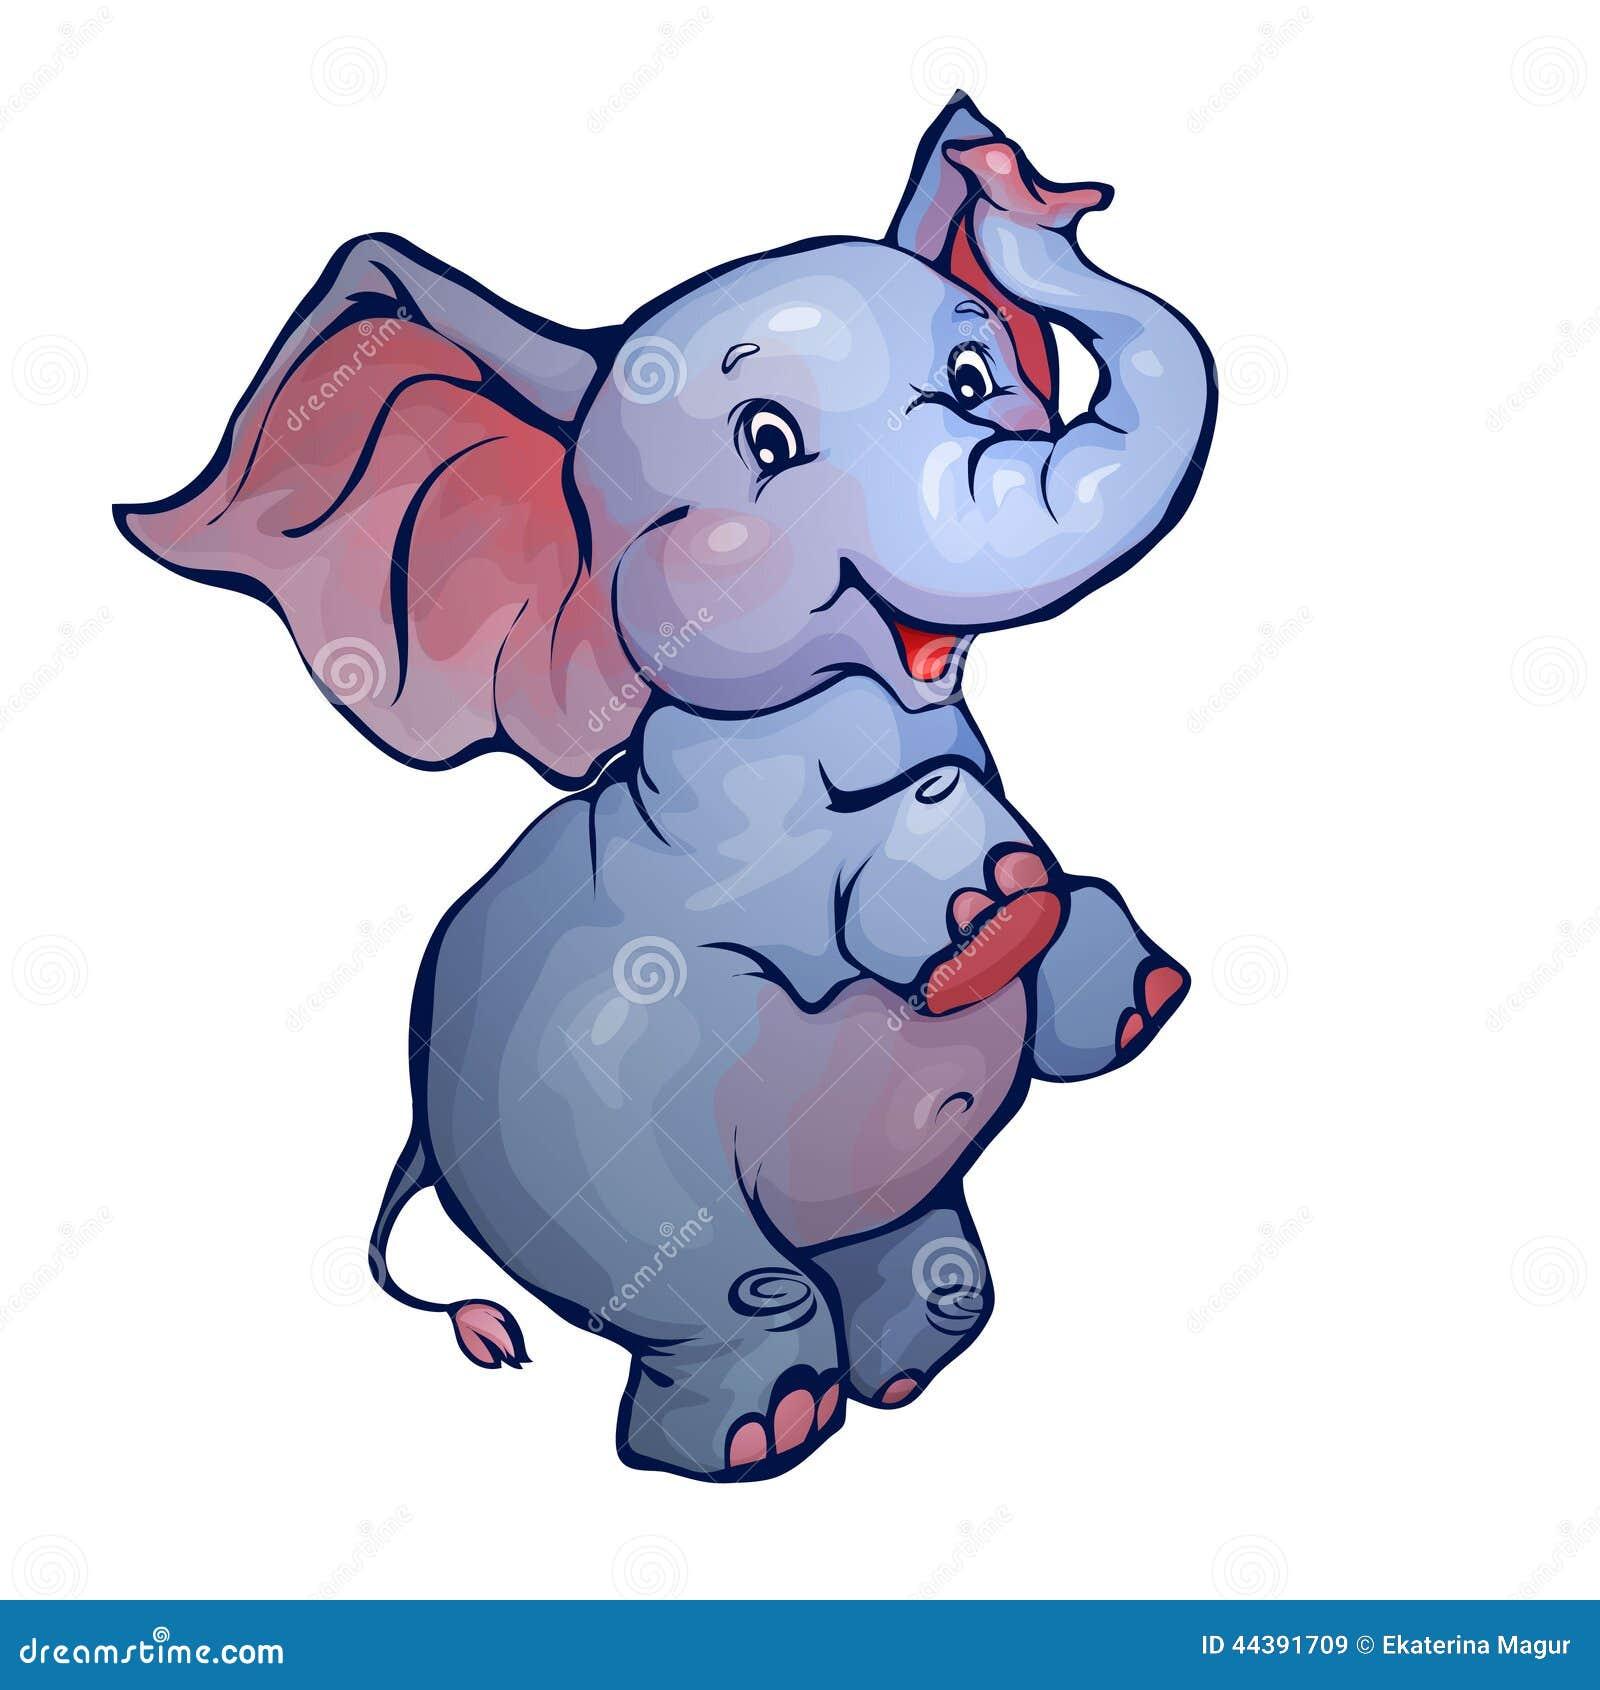 Vector illustration of elephant in cartoon style